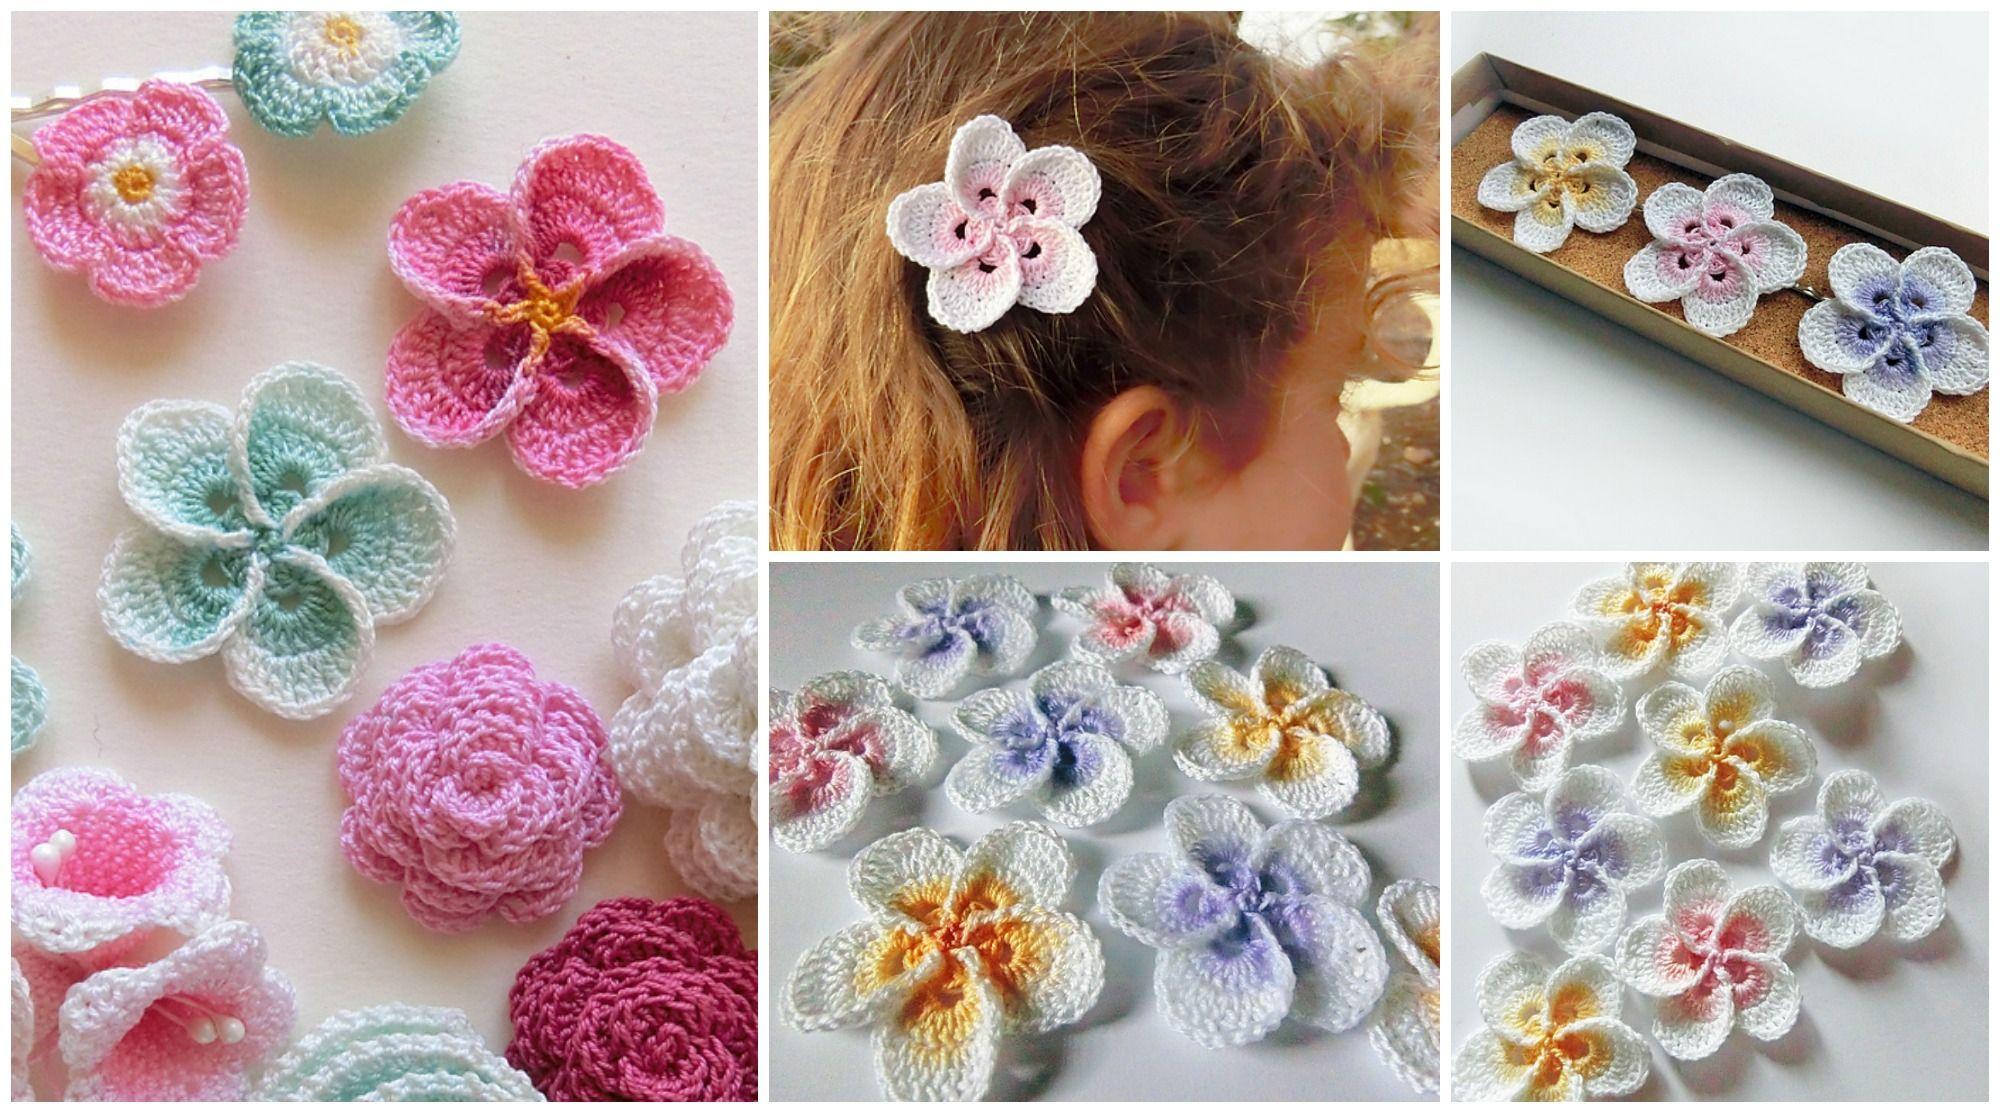 Crochet Hawaiian Plumeria Crochet Pinterest Crochet Crochet